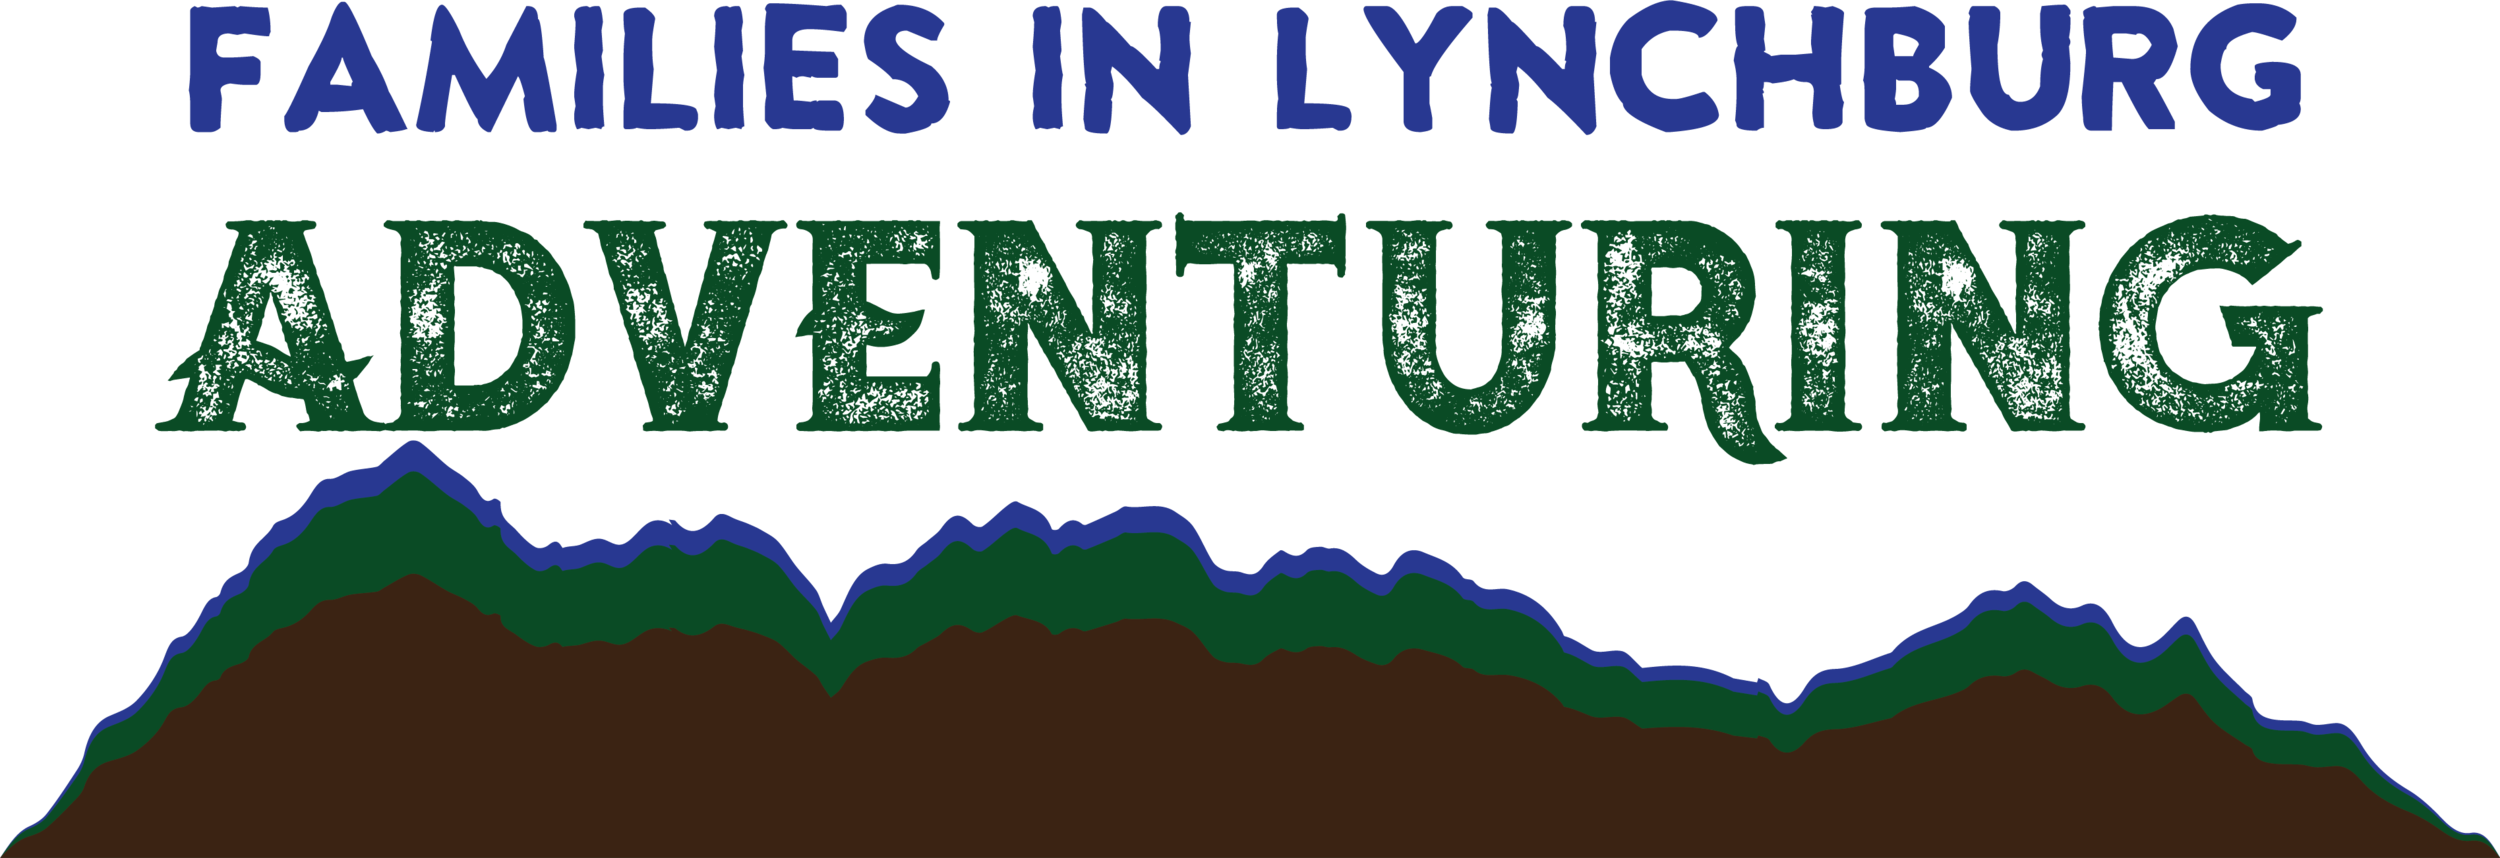 families in lynchburg adventuring